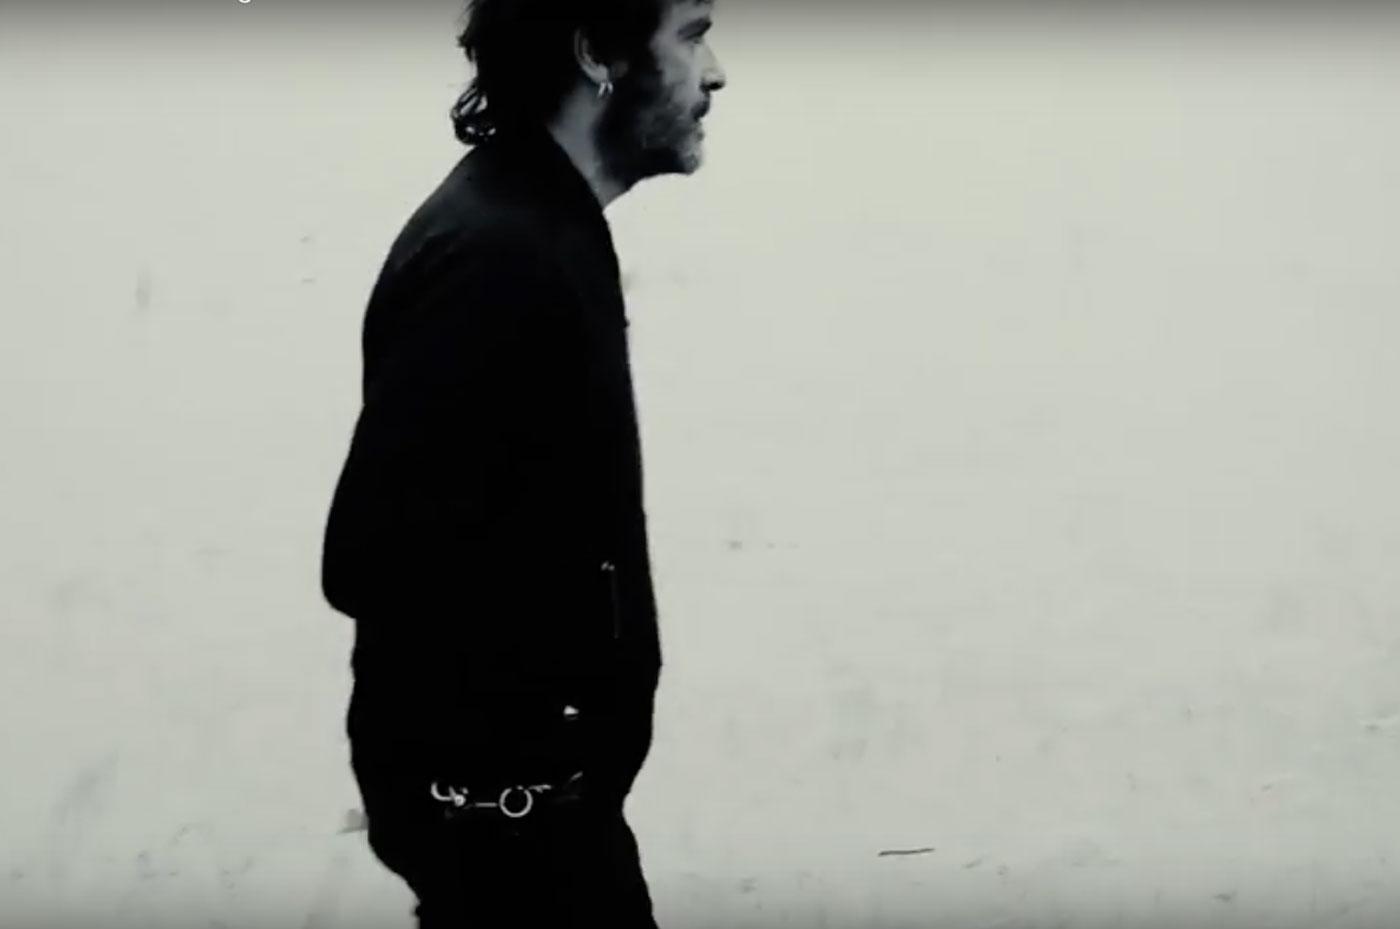 Estreno del videoclip de «Tentative de guérison» de Julien Elsie